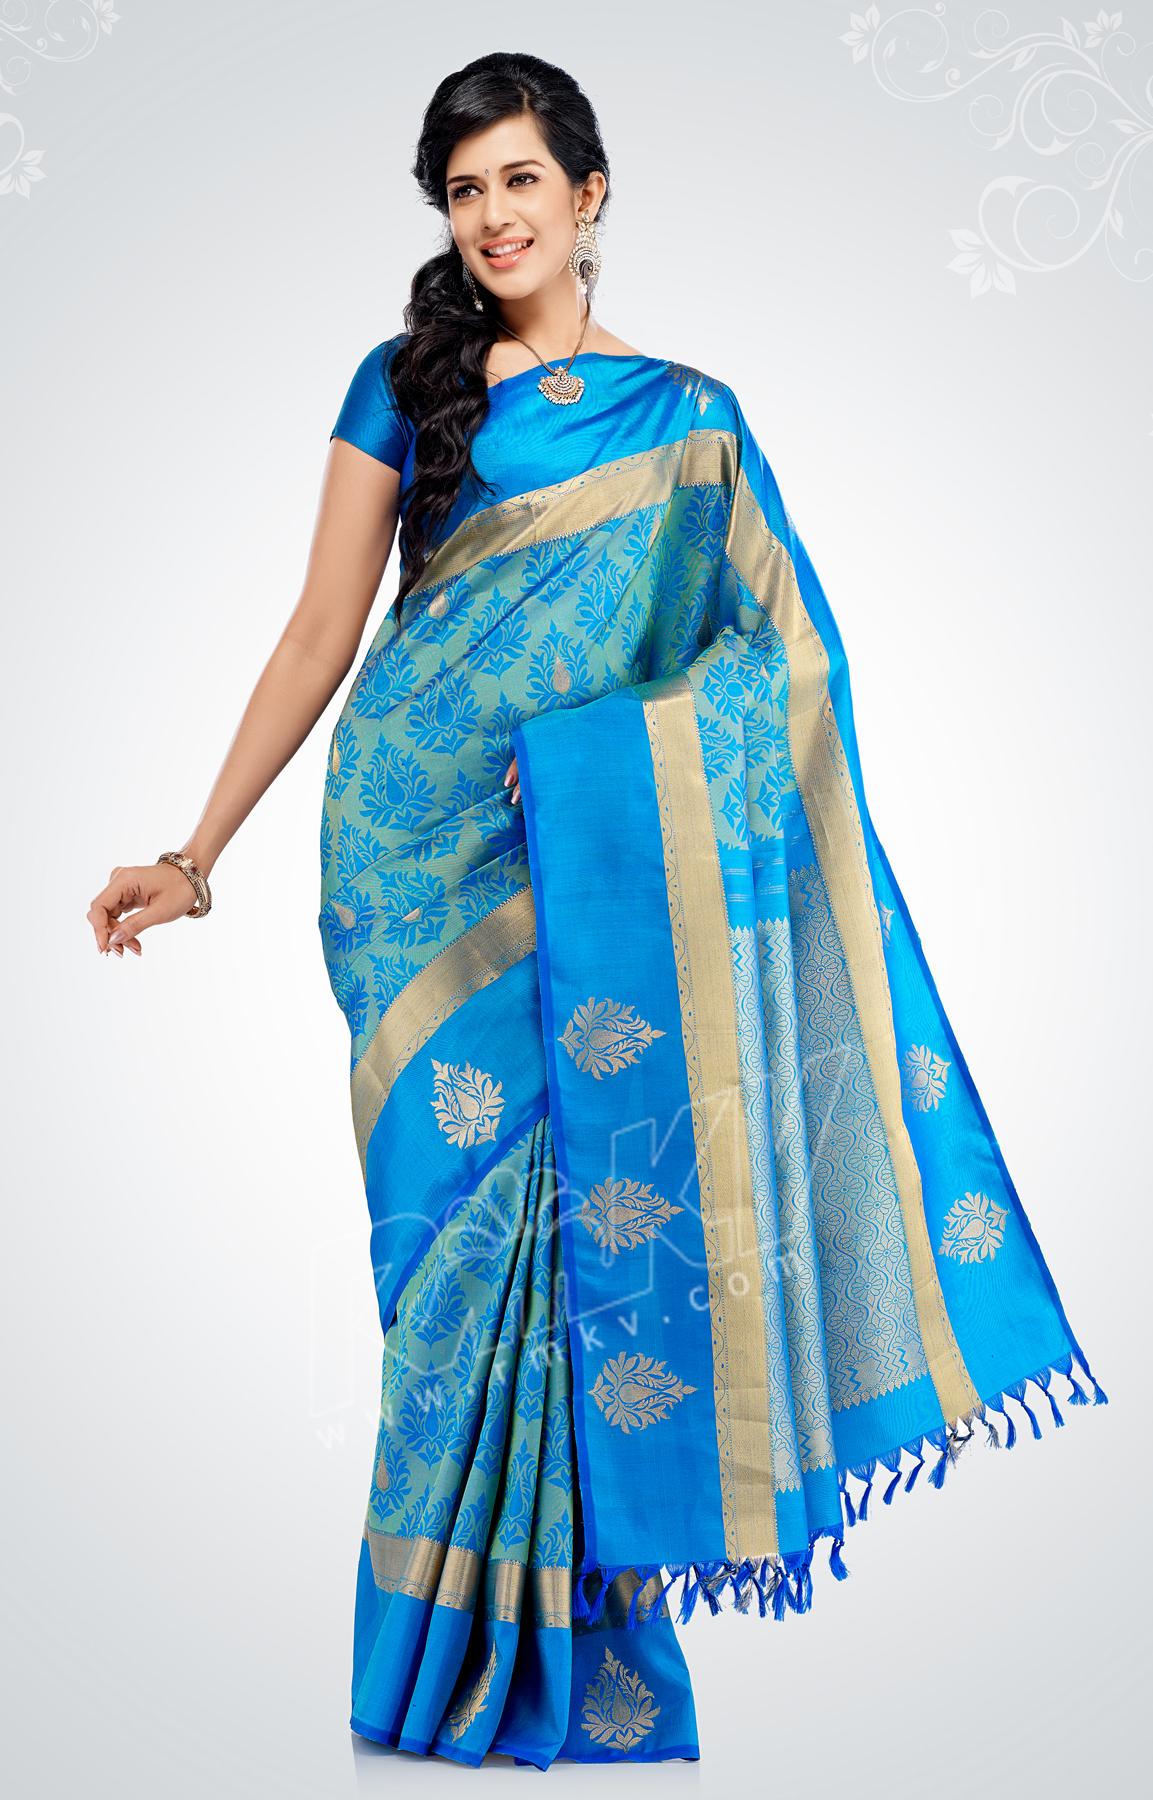 44d35acb94 Blue-green silk saree with large blue borders. - RmKV Silks | Silk ...